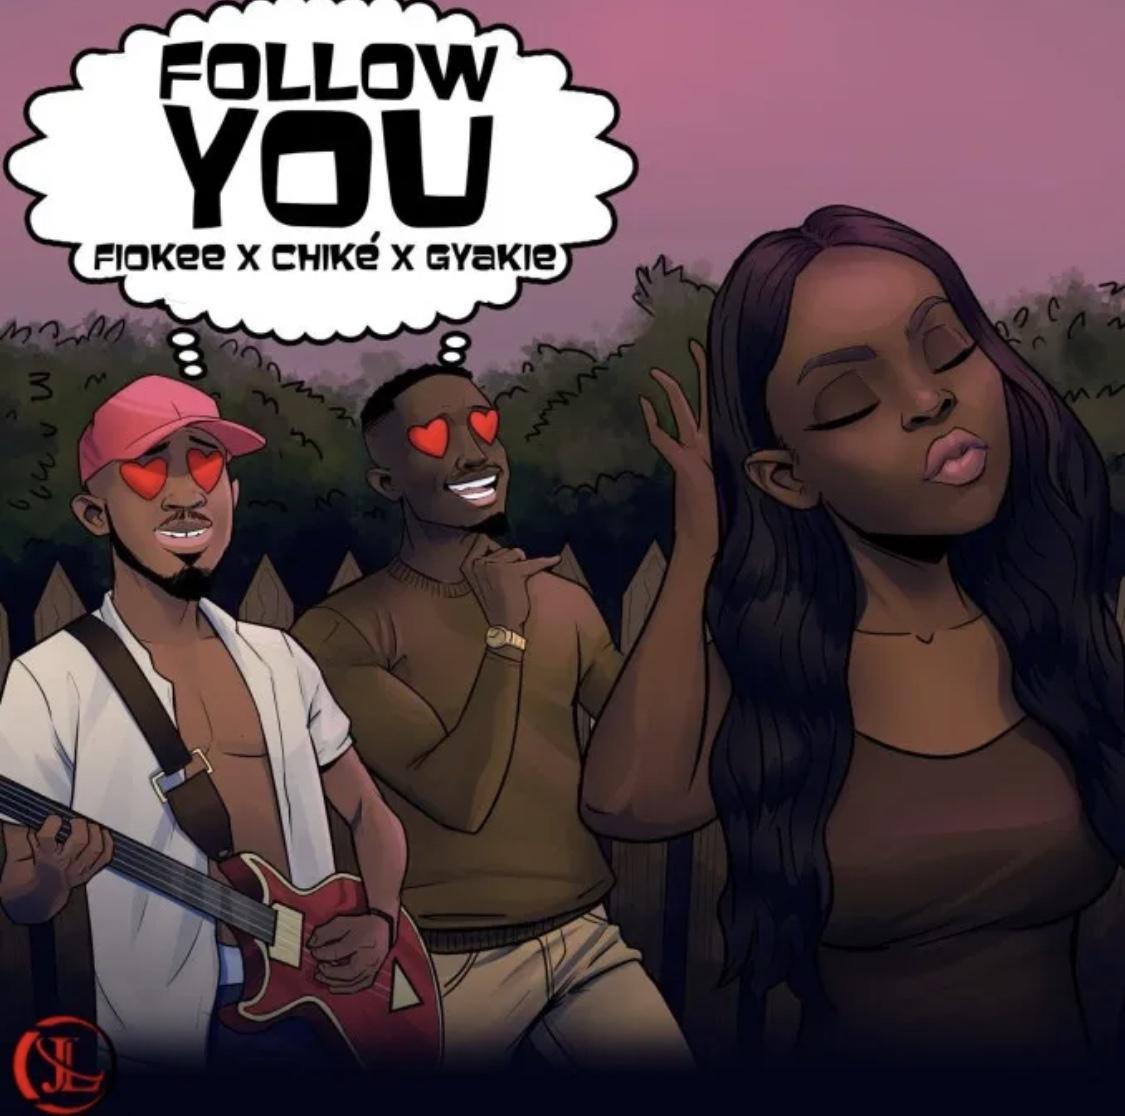 Fiokee Ft. Chike & Gyakie – Follow You